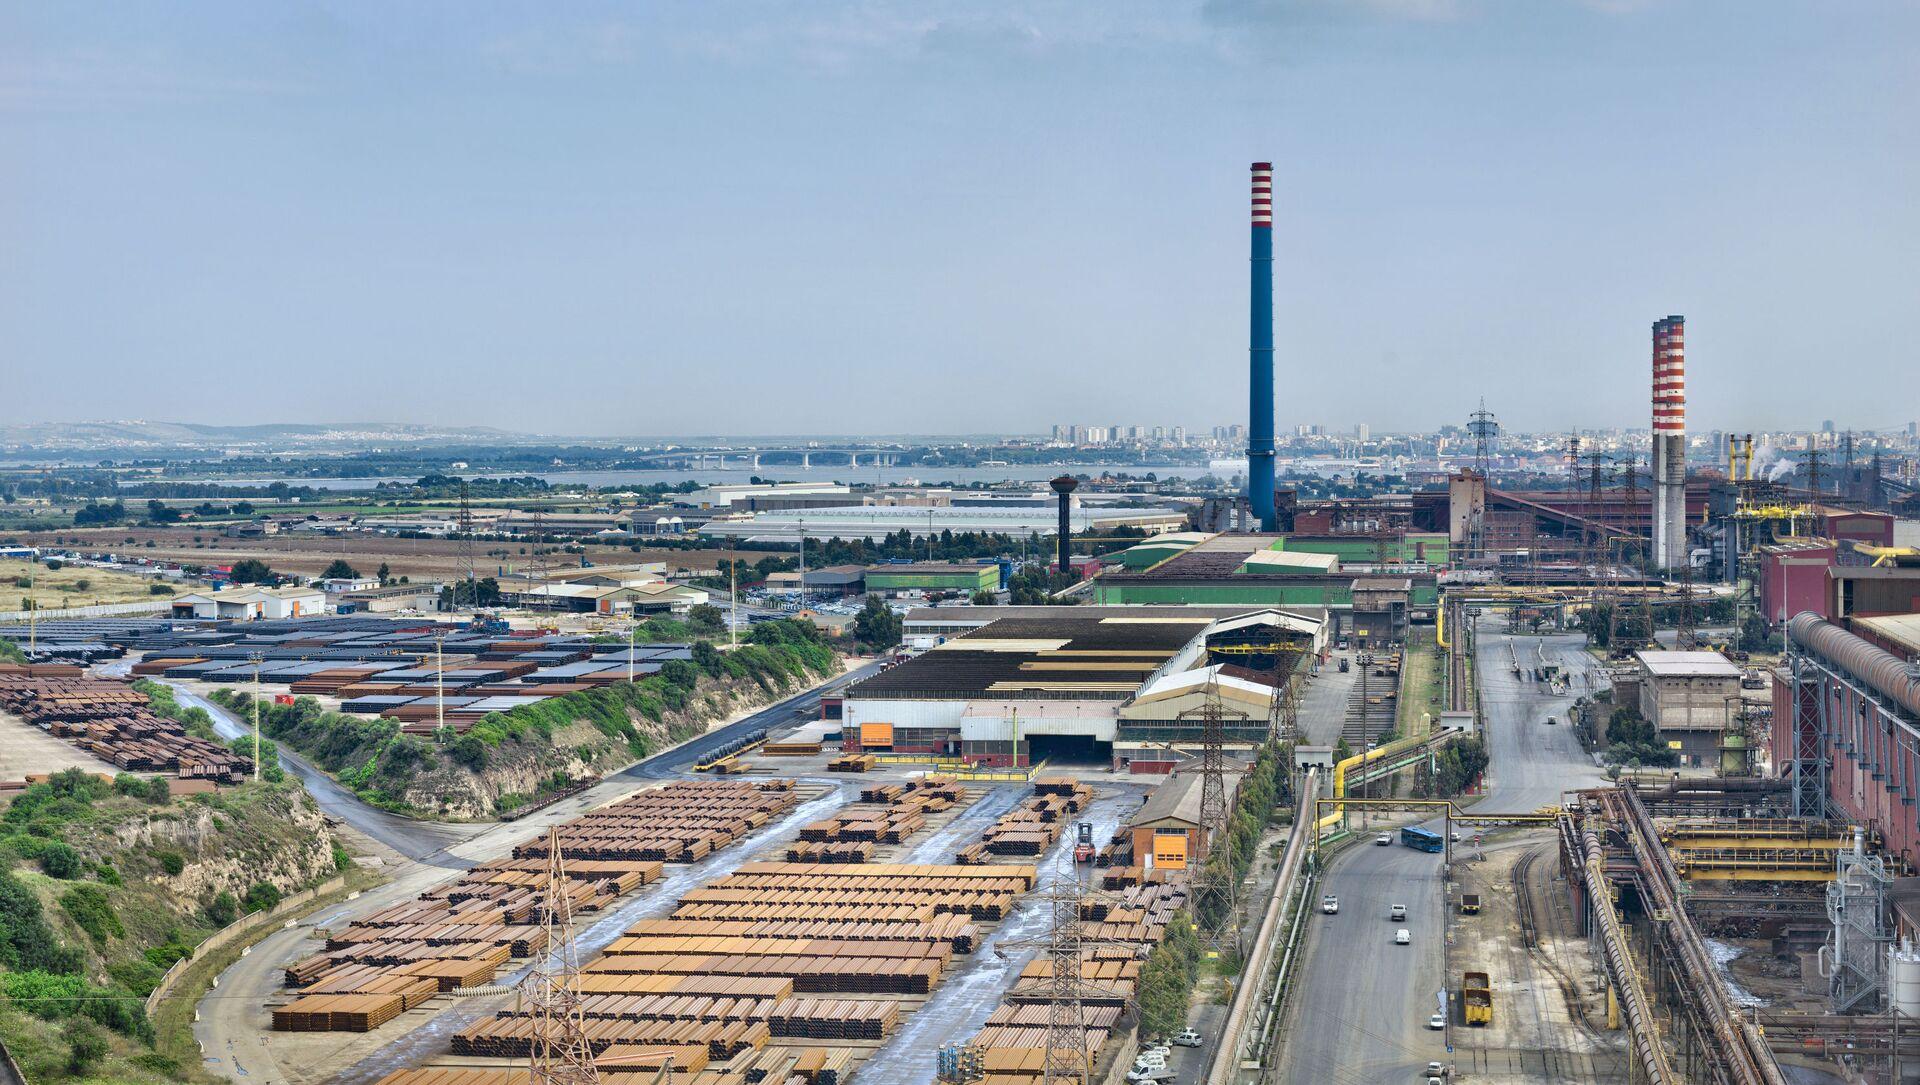 Arcelor Mittal, l'area a caldo continuerà a produrre: accolta sospensiva - Sputnik Italia, 1920, 13.03.2021